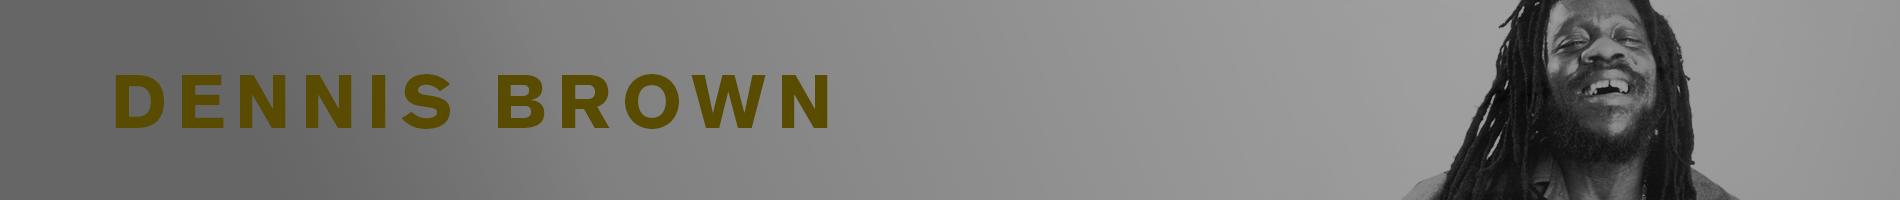 dennis-brown-banner-vp-reggae-1900x200b.png